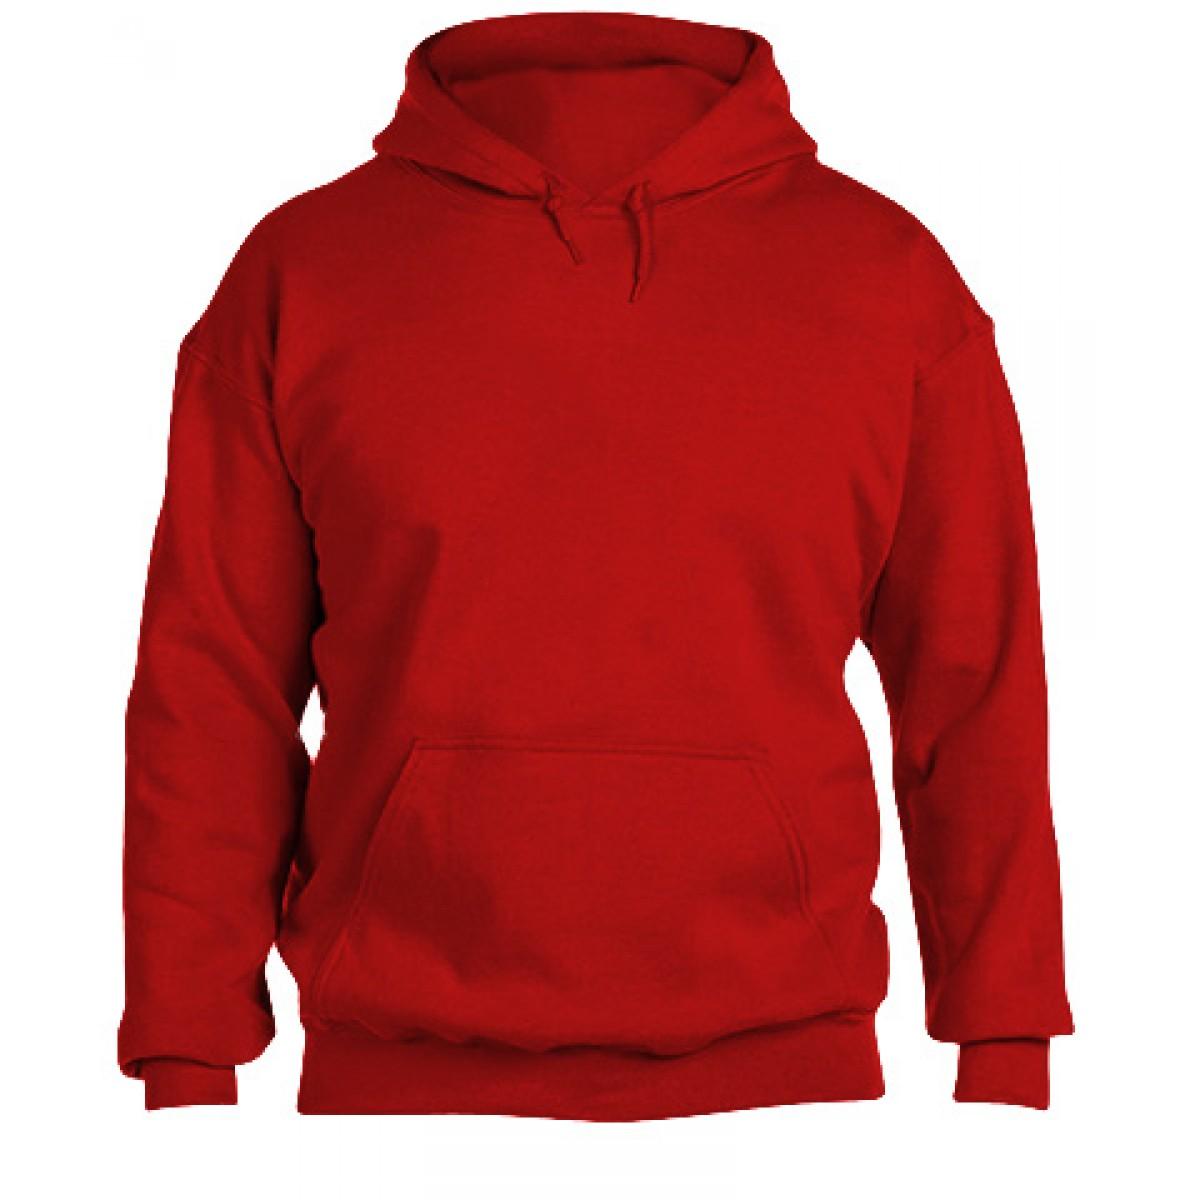 Hooded Sweatshirt 50/50 Heavy Blend -Red-XL